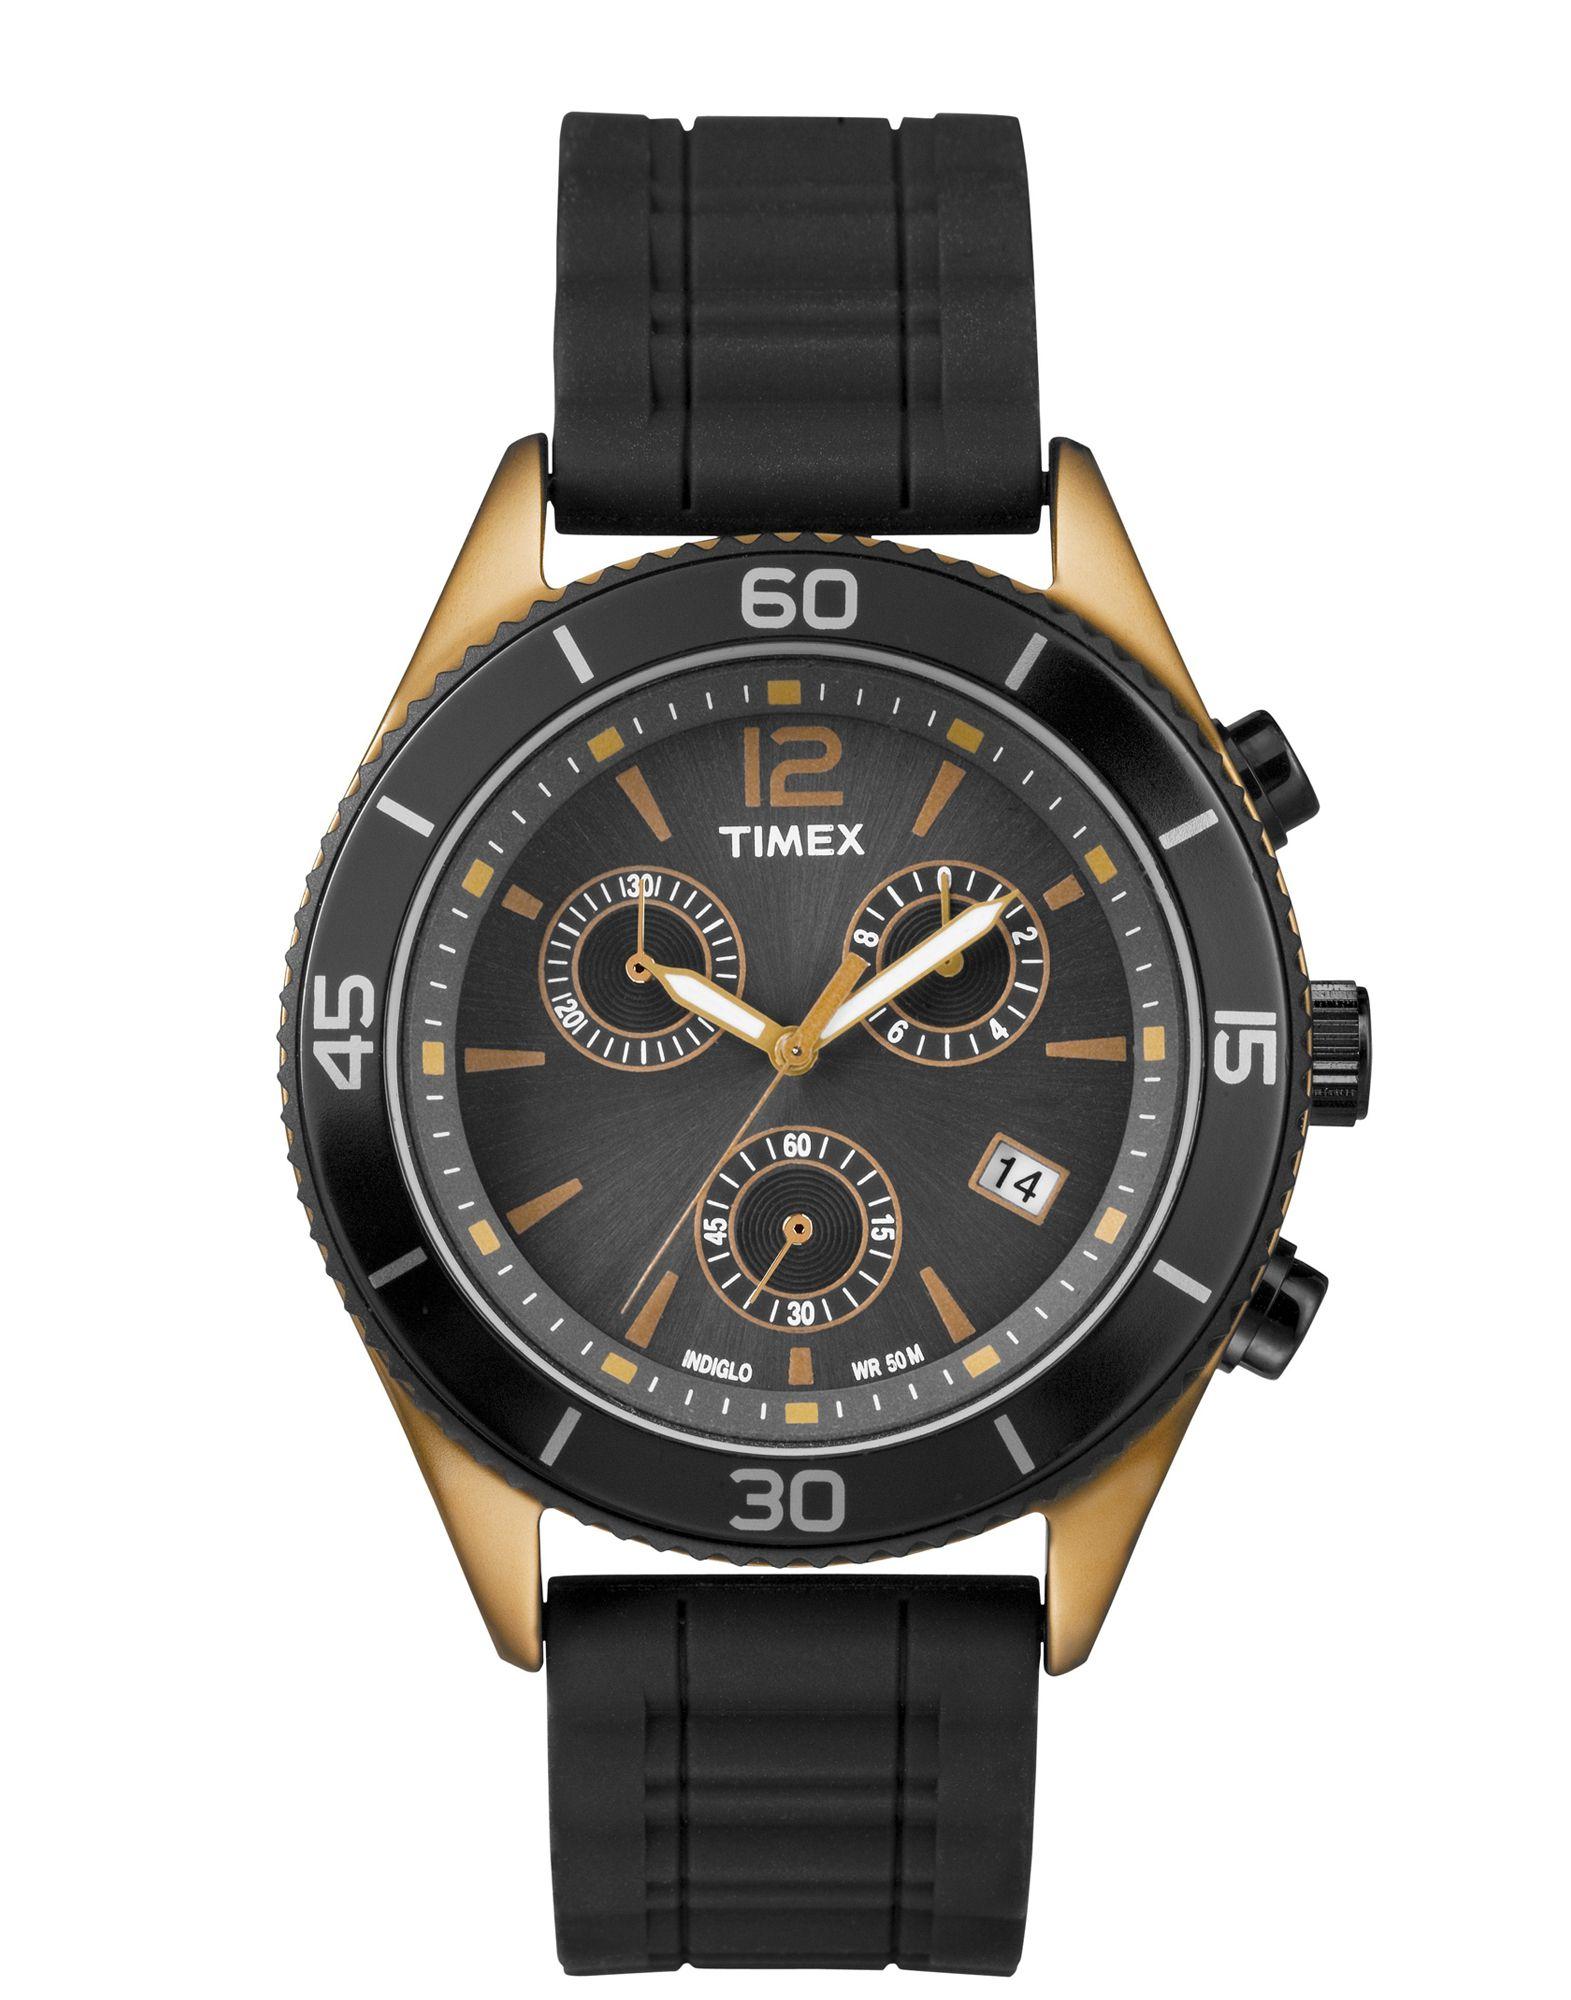 Lyst - Timex Wrist Watch in Black for Men